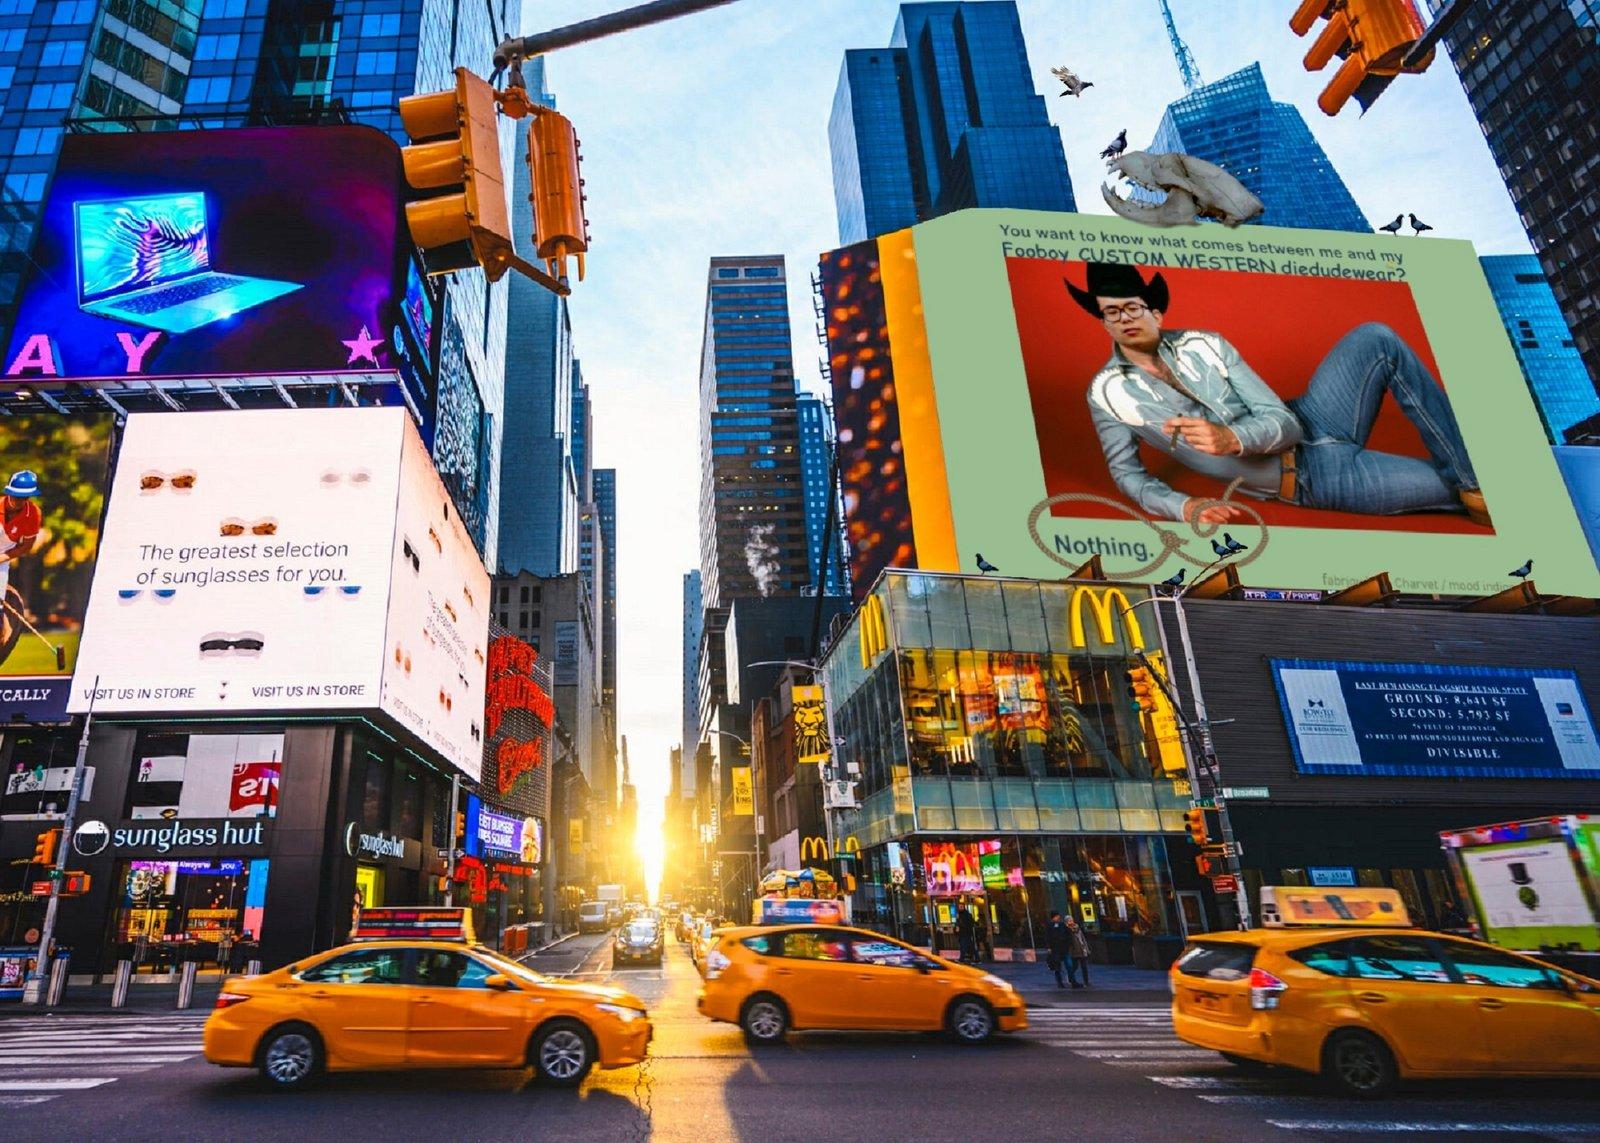 Urban Fooboy_Times Square_2022-01-01.jpg